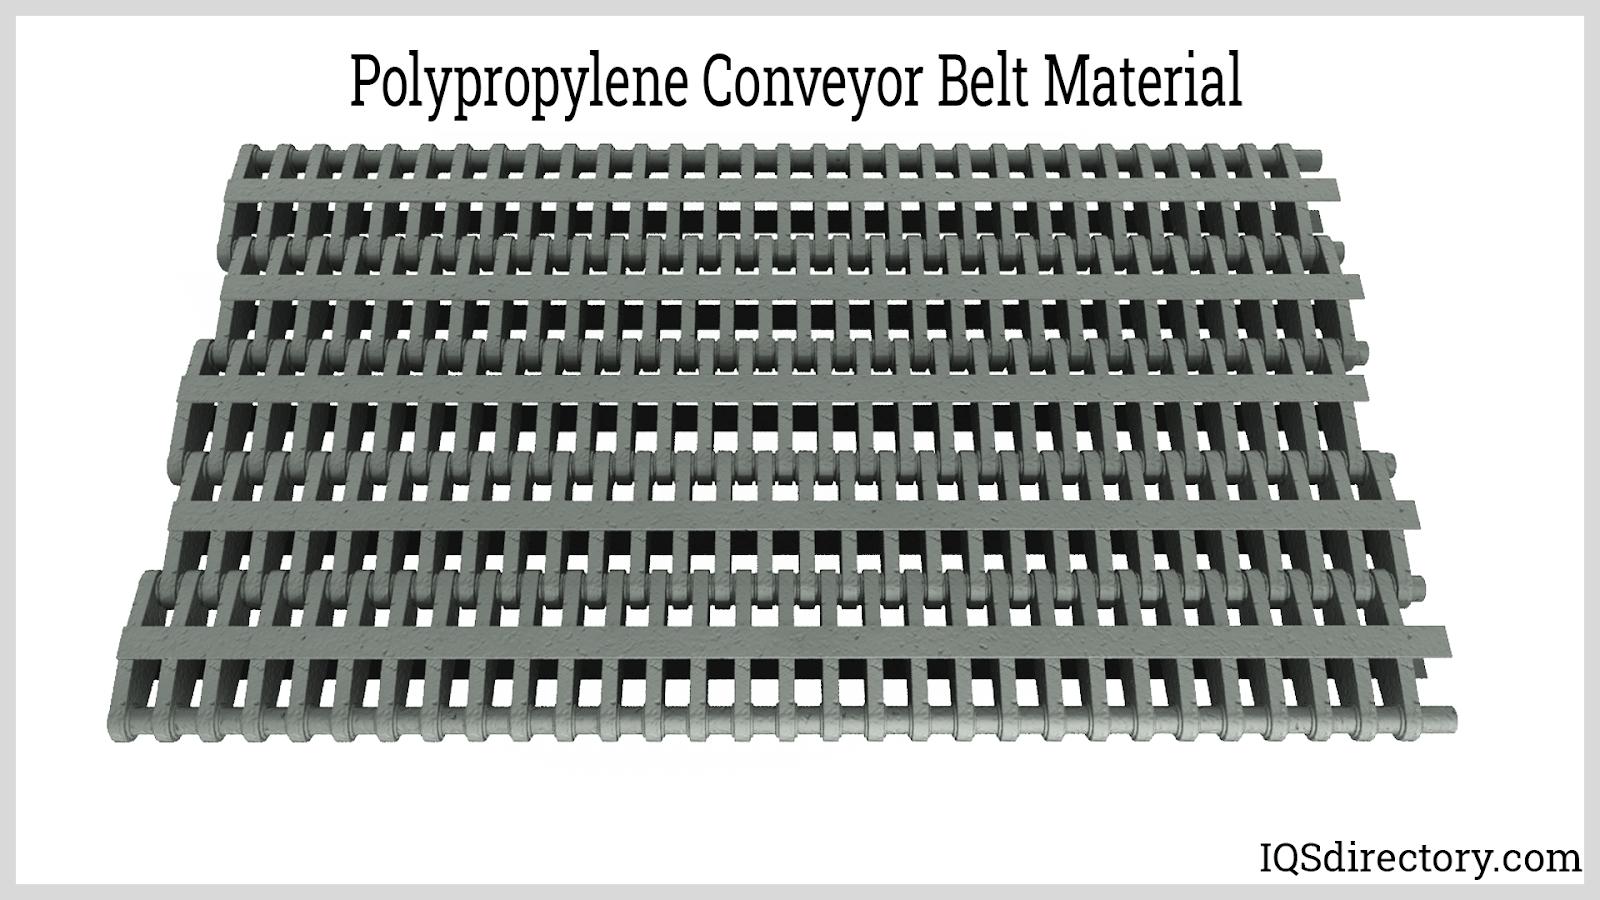 Polypropylene Conveyor Belt Material